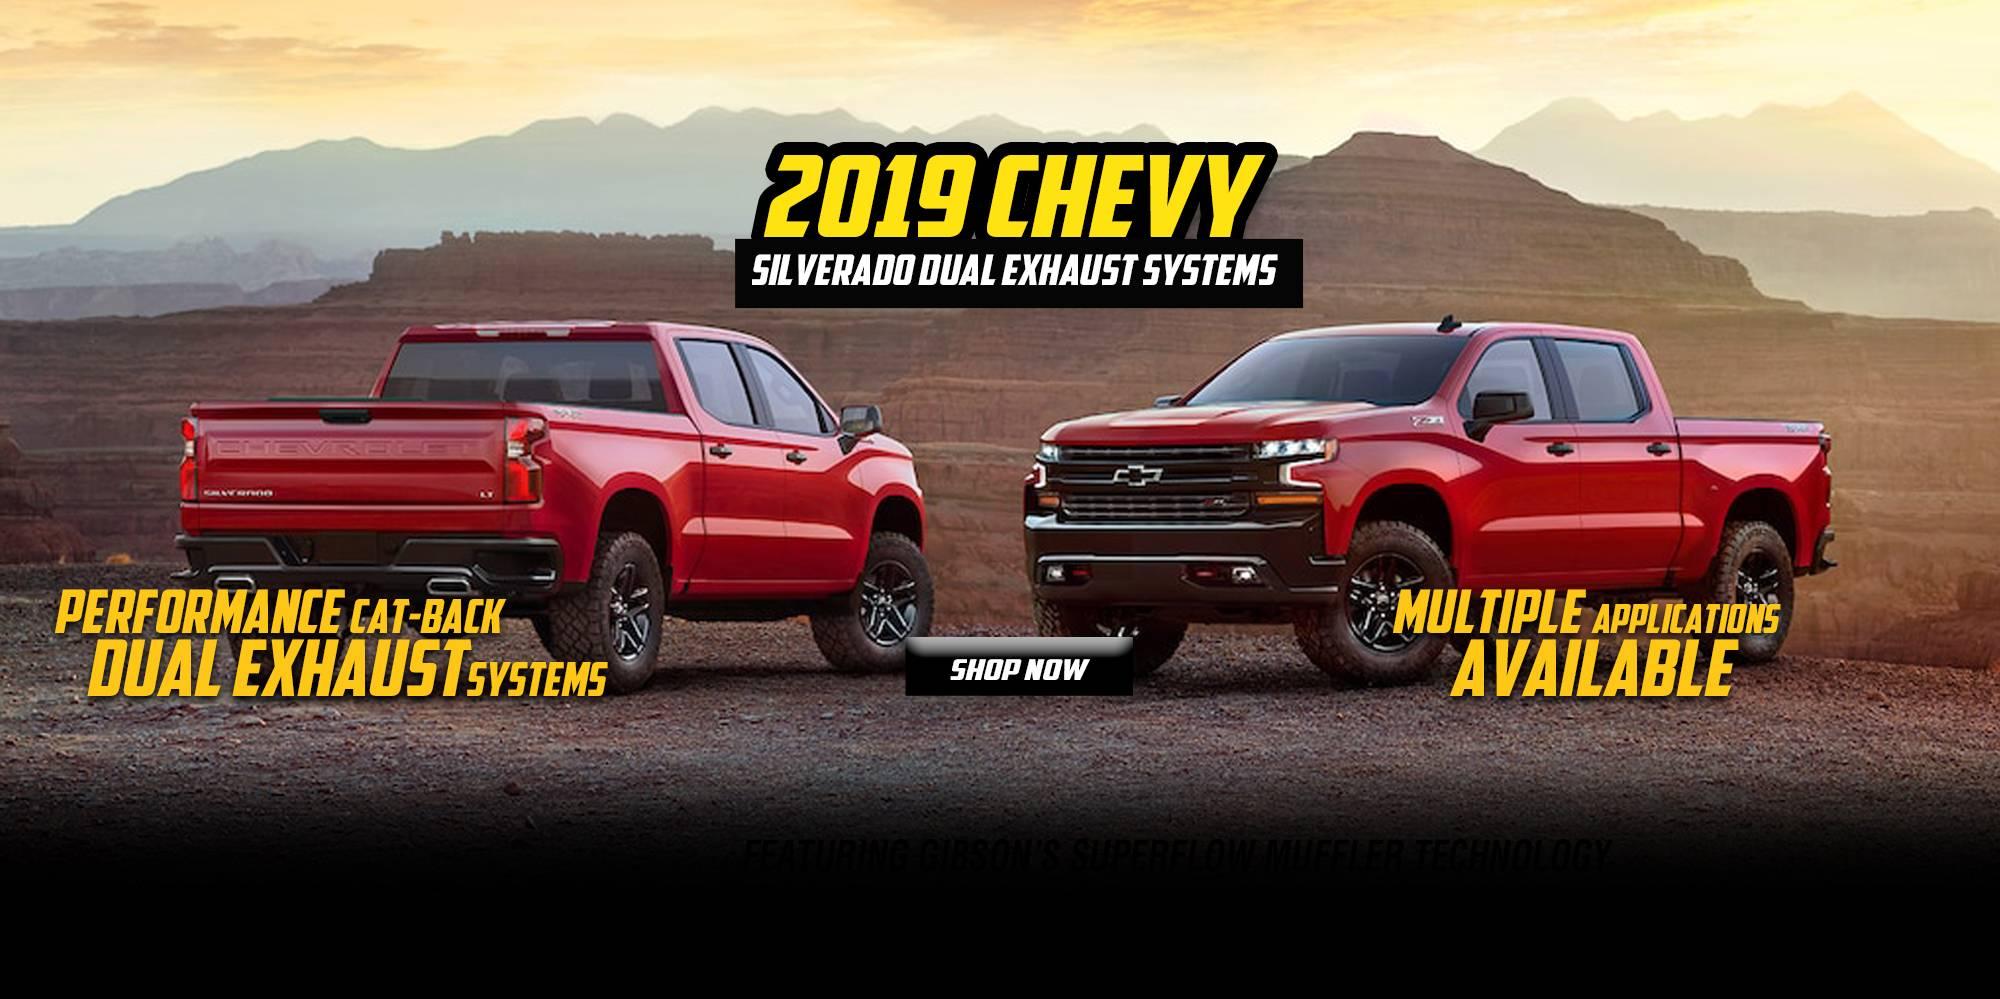 2019 Chevy